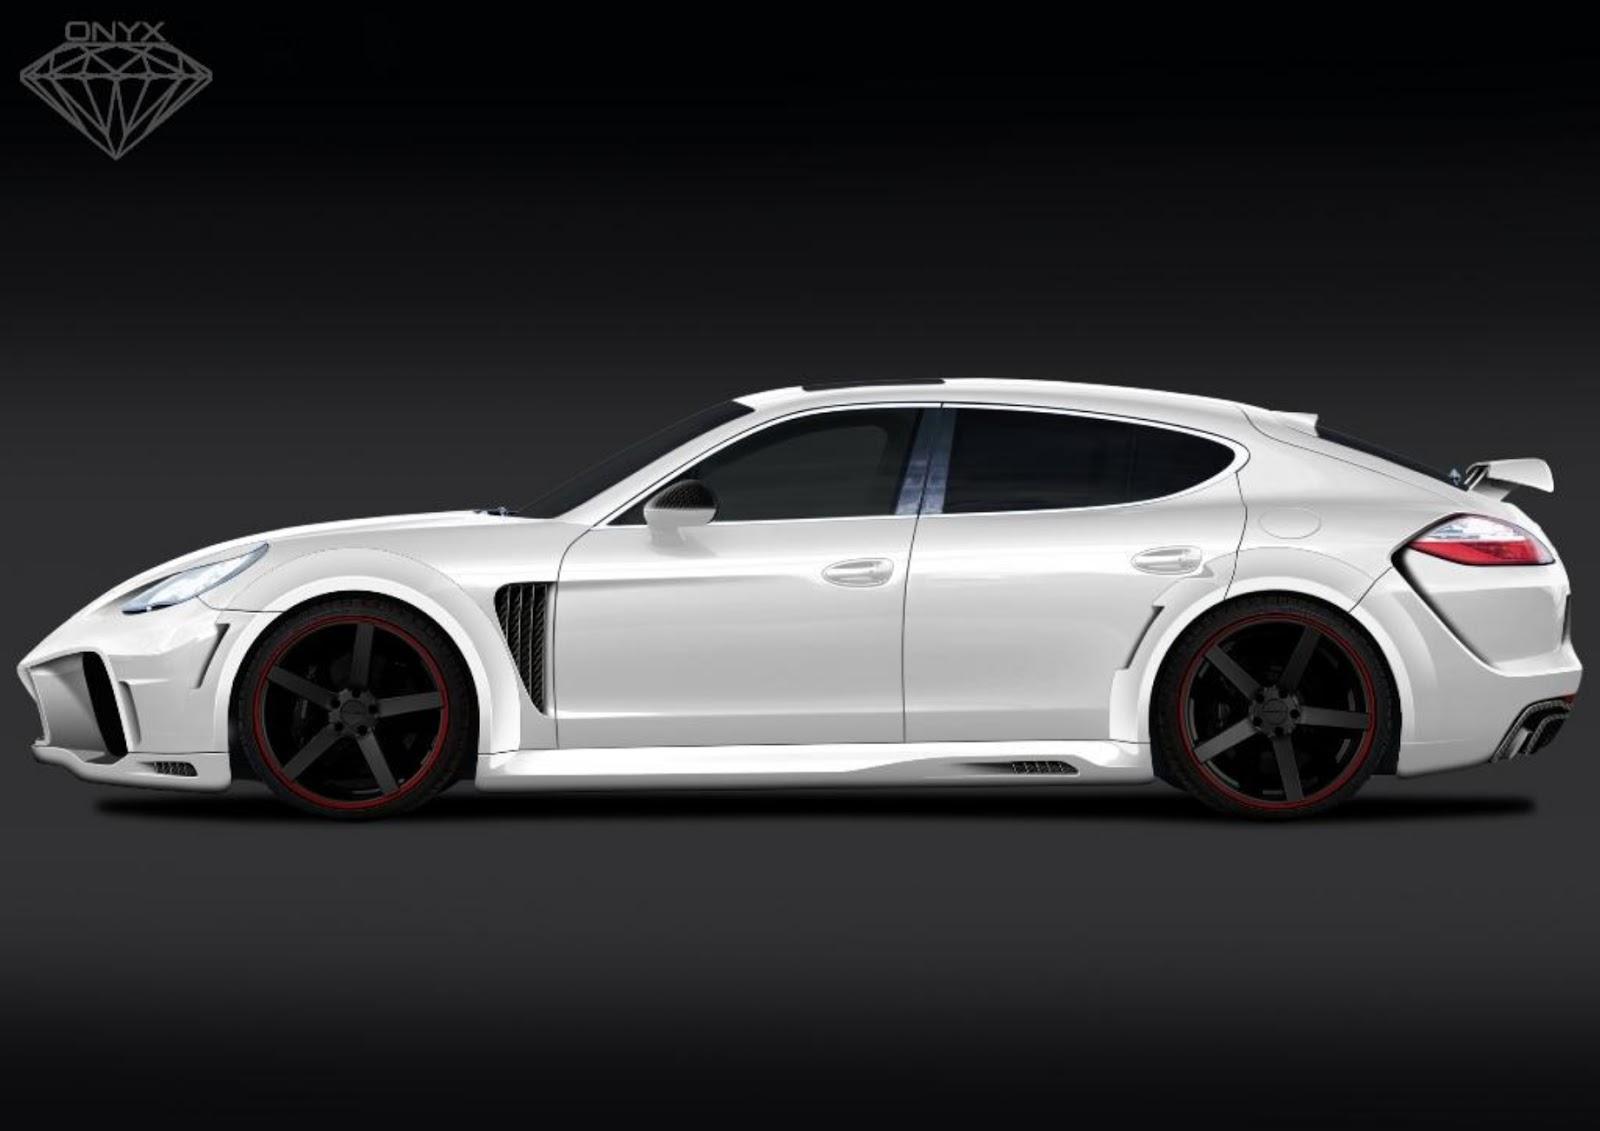 All cars nz 2013 porsche panamera gst edition by onyx